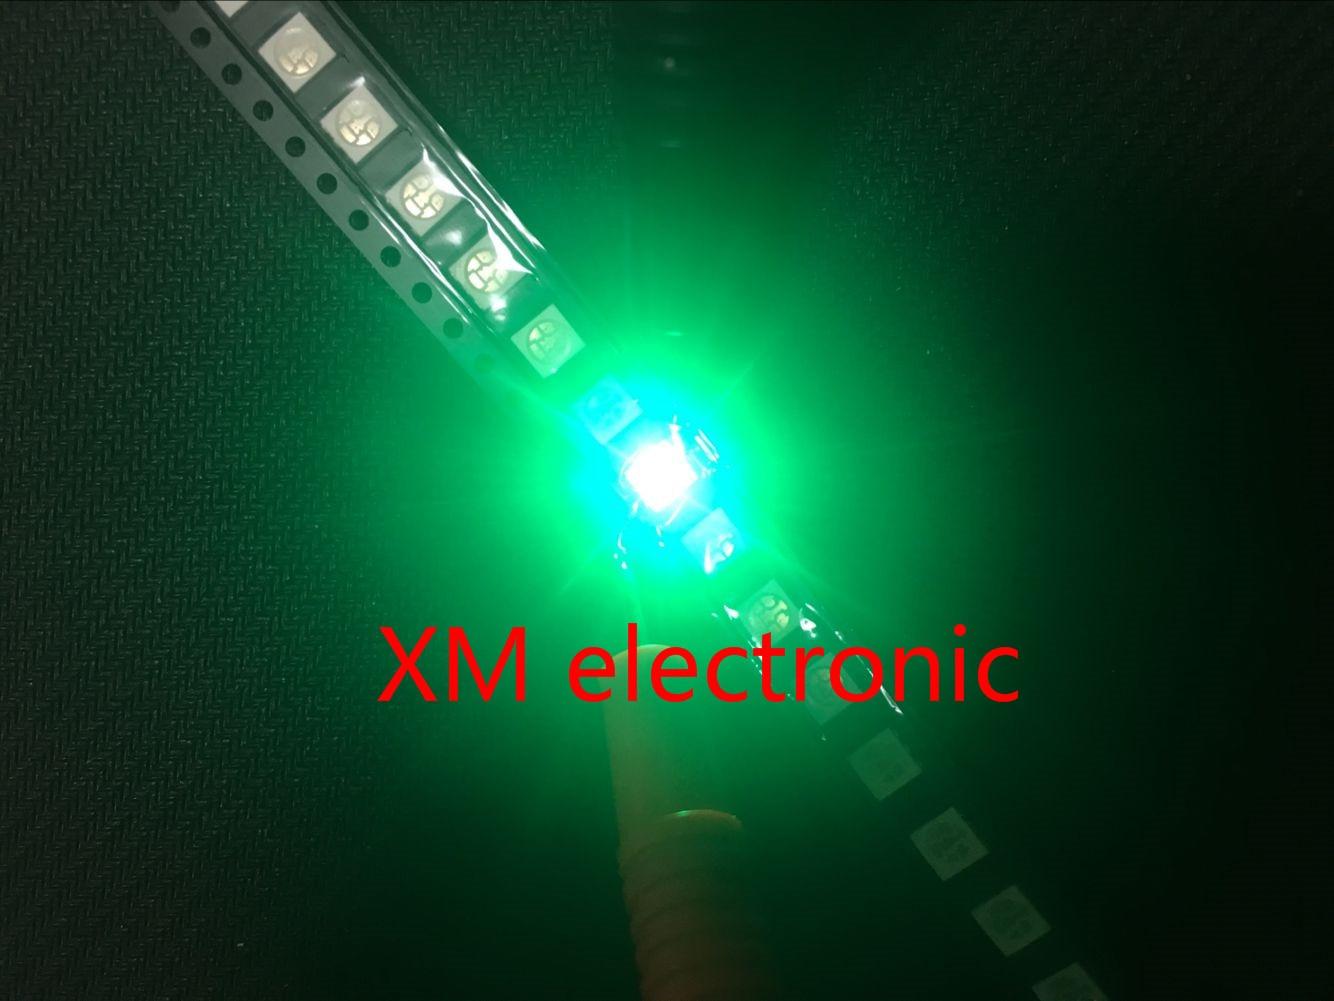 100pcs 5050 SMD Green PLCC-6 3-CHIPS 9000 <font><b>MCD</b></font> Ultra Bright <font><b>LED</b></font> High quality light-emitting diodes 5050 Green <font><b>LED</b></font> 5050 Diodes